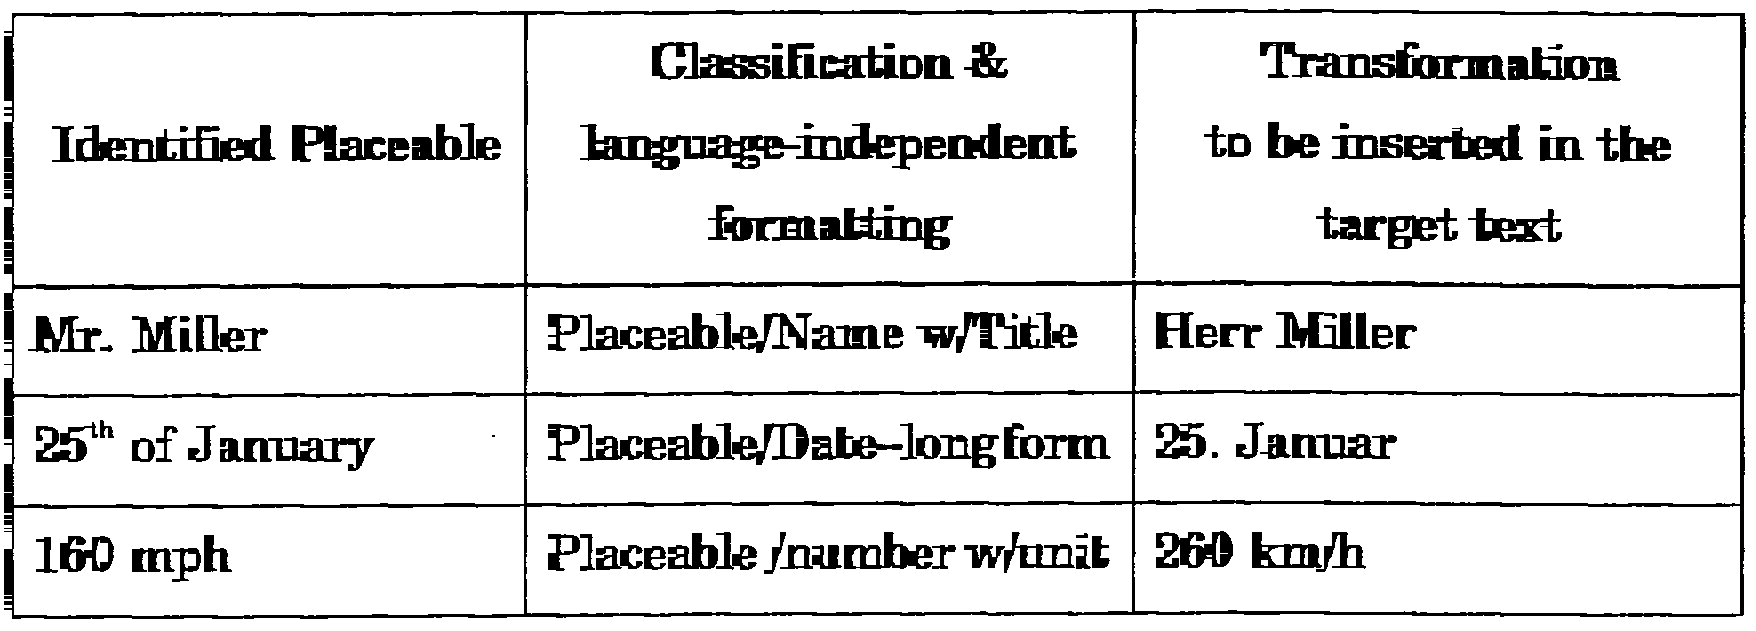 WO1999057651A1 - Machine-assisted translation tools - Google